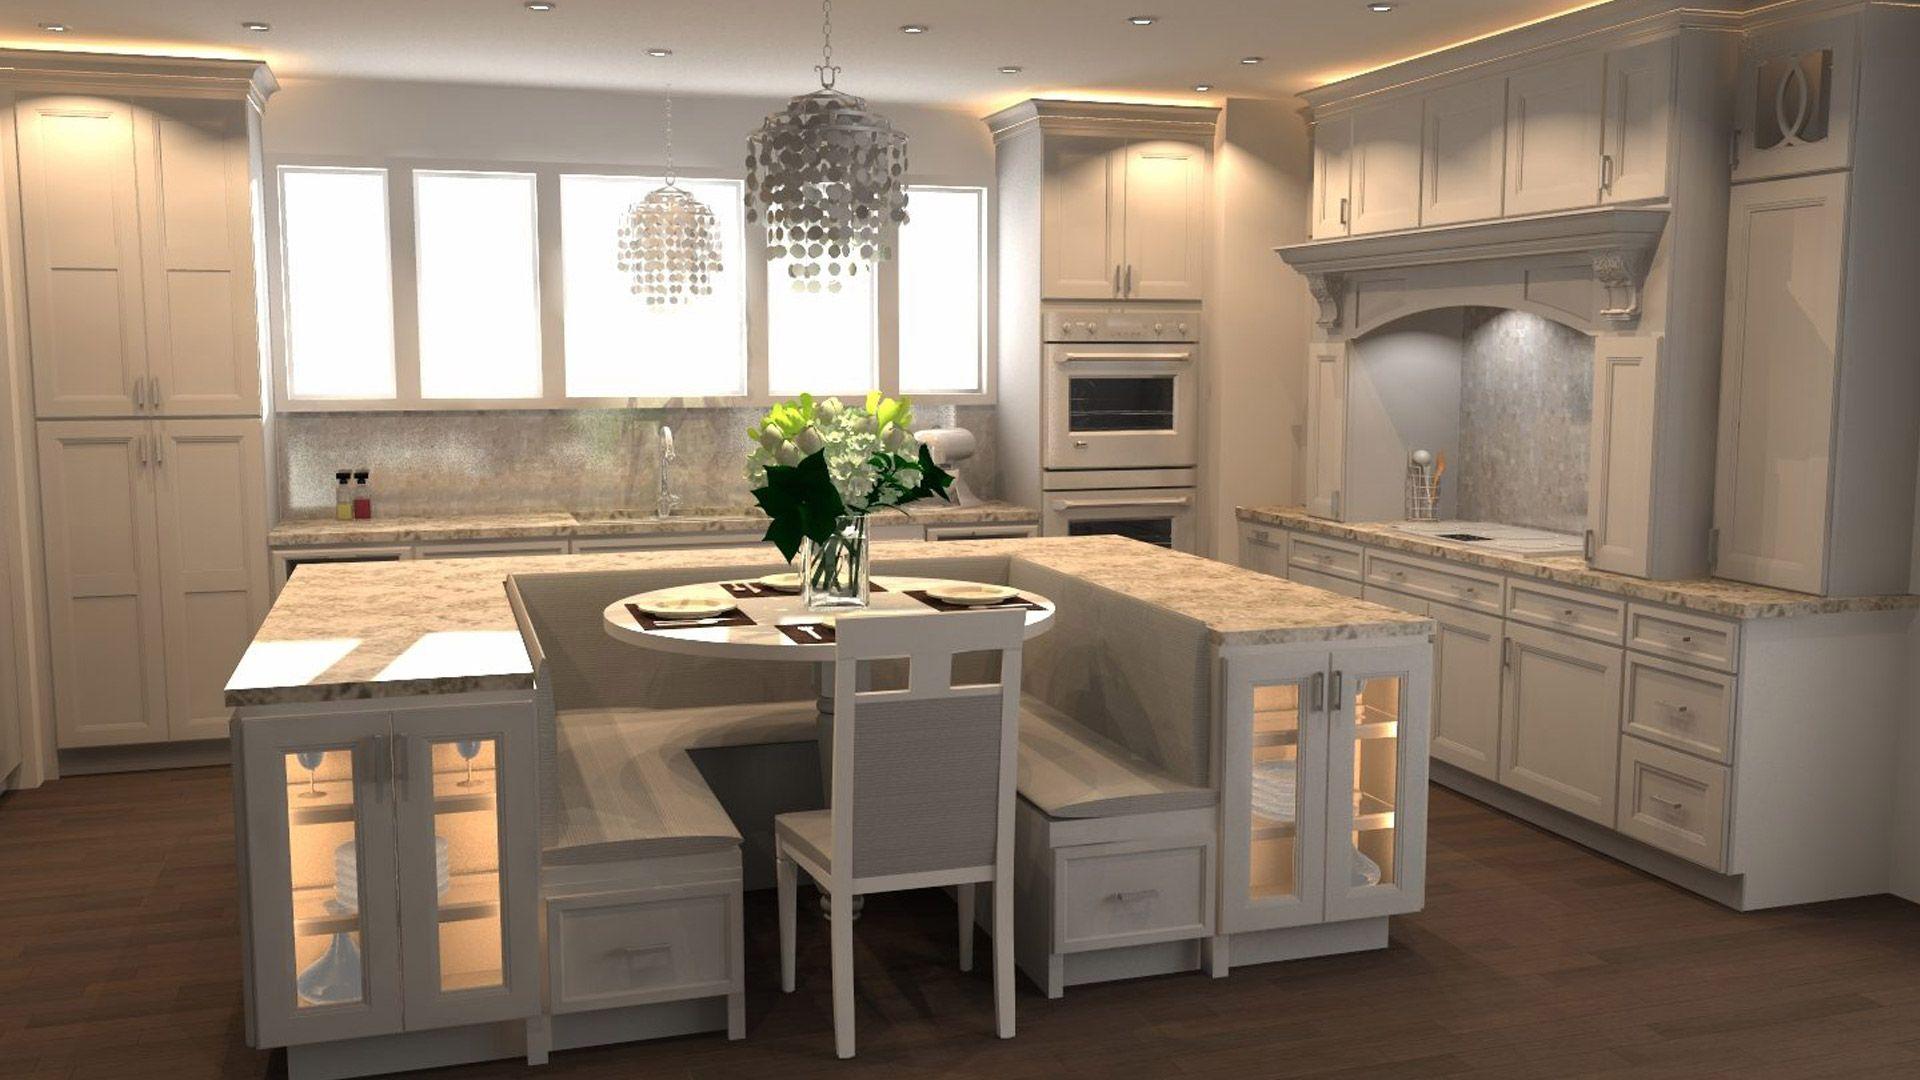 2020 Design Kitchen Design Free Kitchen Design Latest